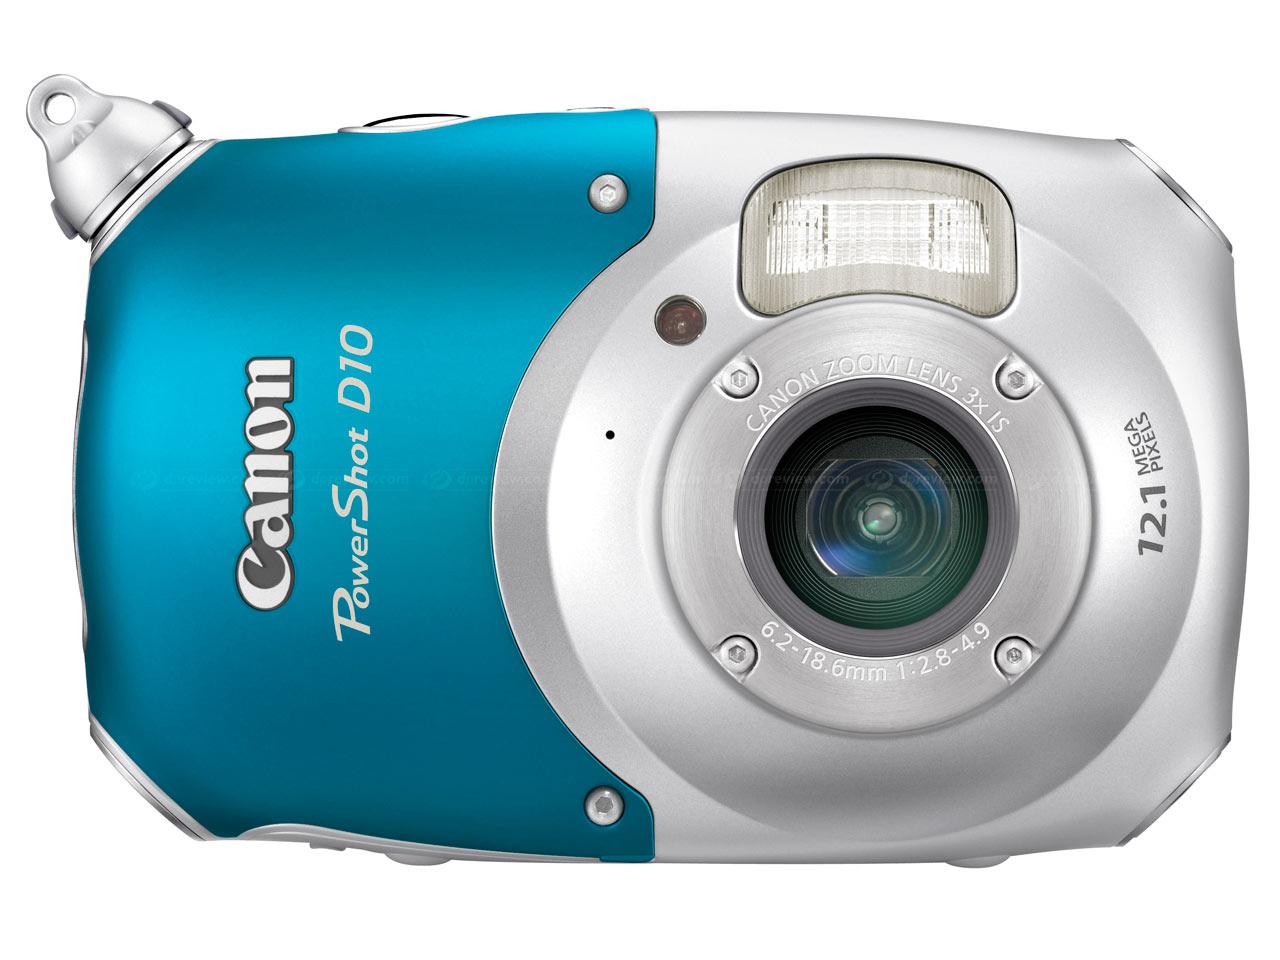 http://1.bp.blogspot.com/-D9N6f3_rFRA/Ti72sgVpFnI/AAAAAAAAAEw/dLpyXcm0AHg/s1600/Canon-D10-DIgital-camera-jpg.jpg